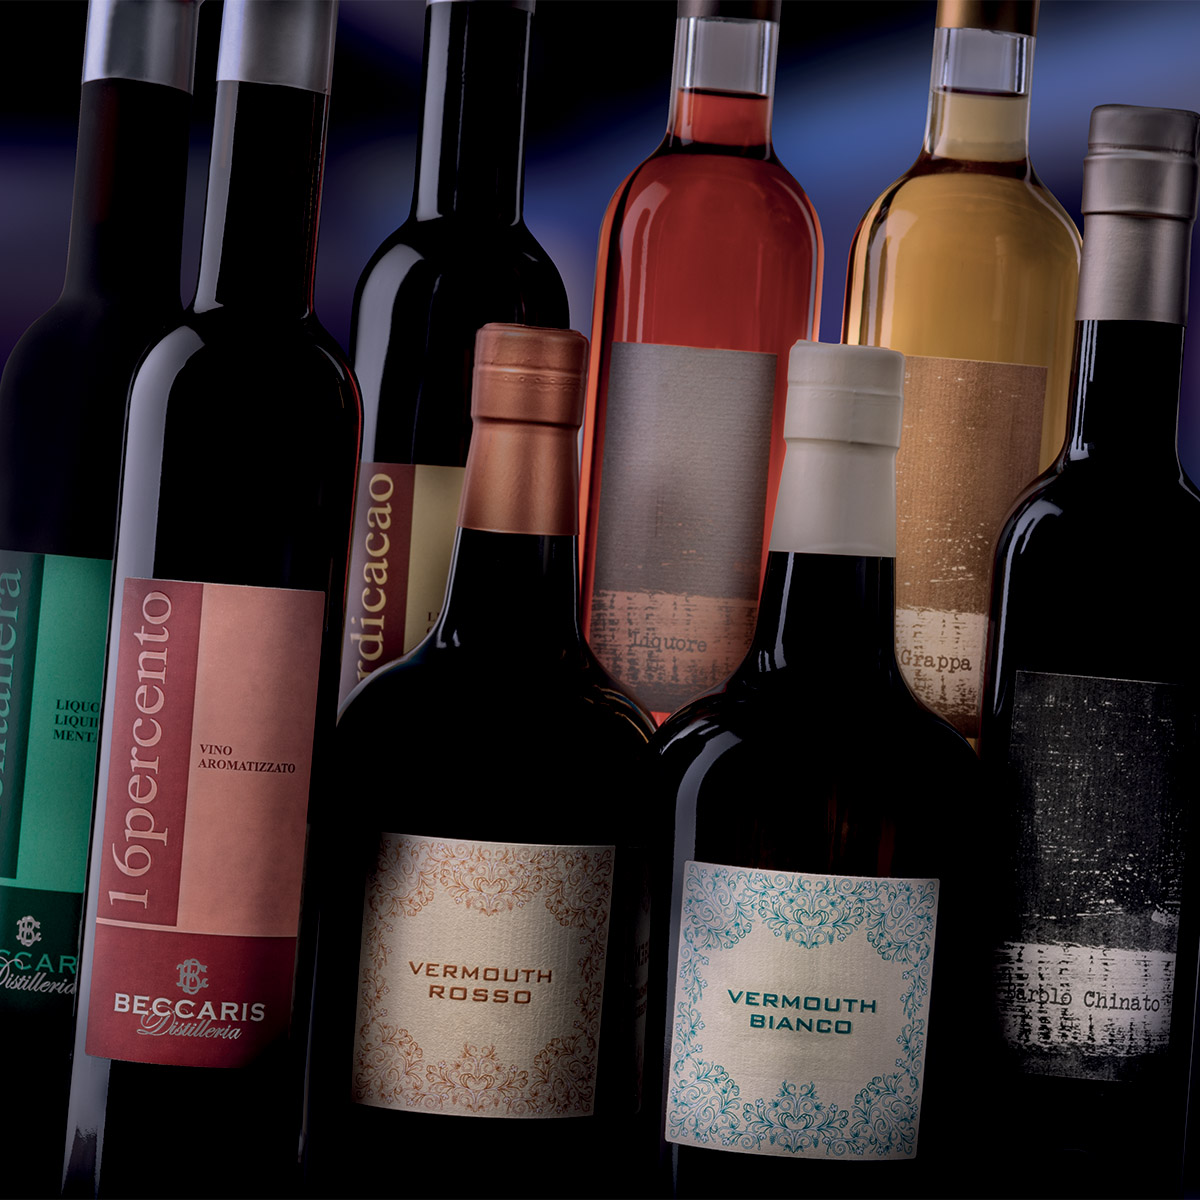 Golosa, Vermouth, Spirito Onirico.